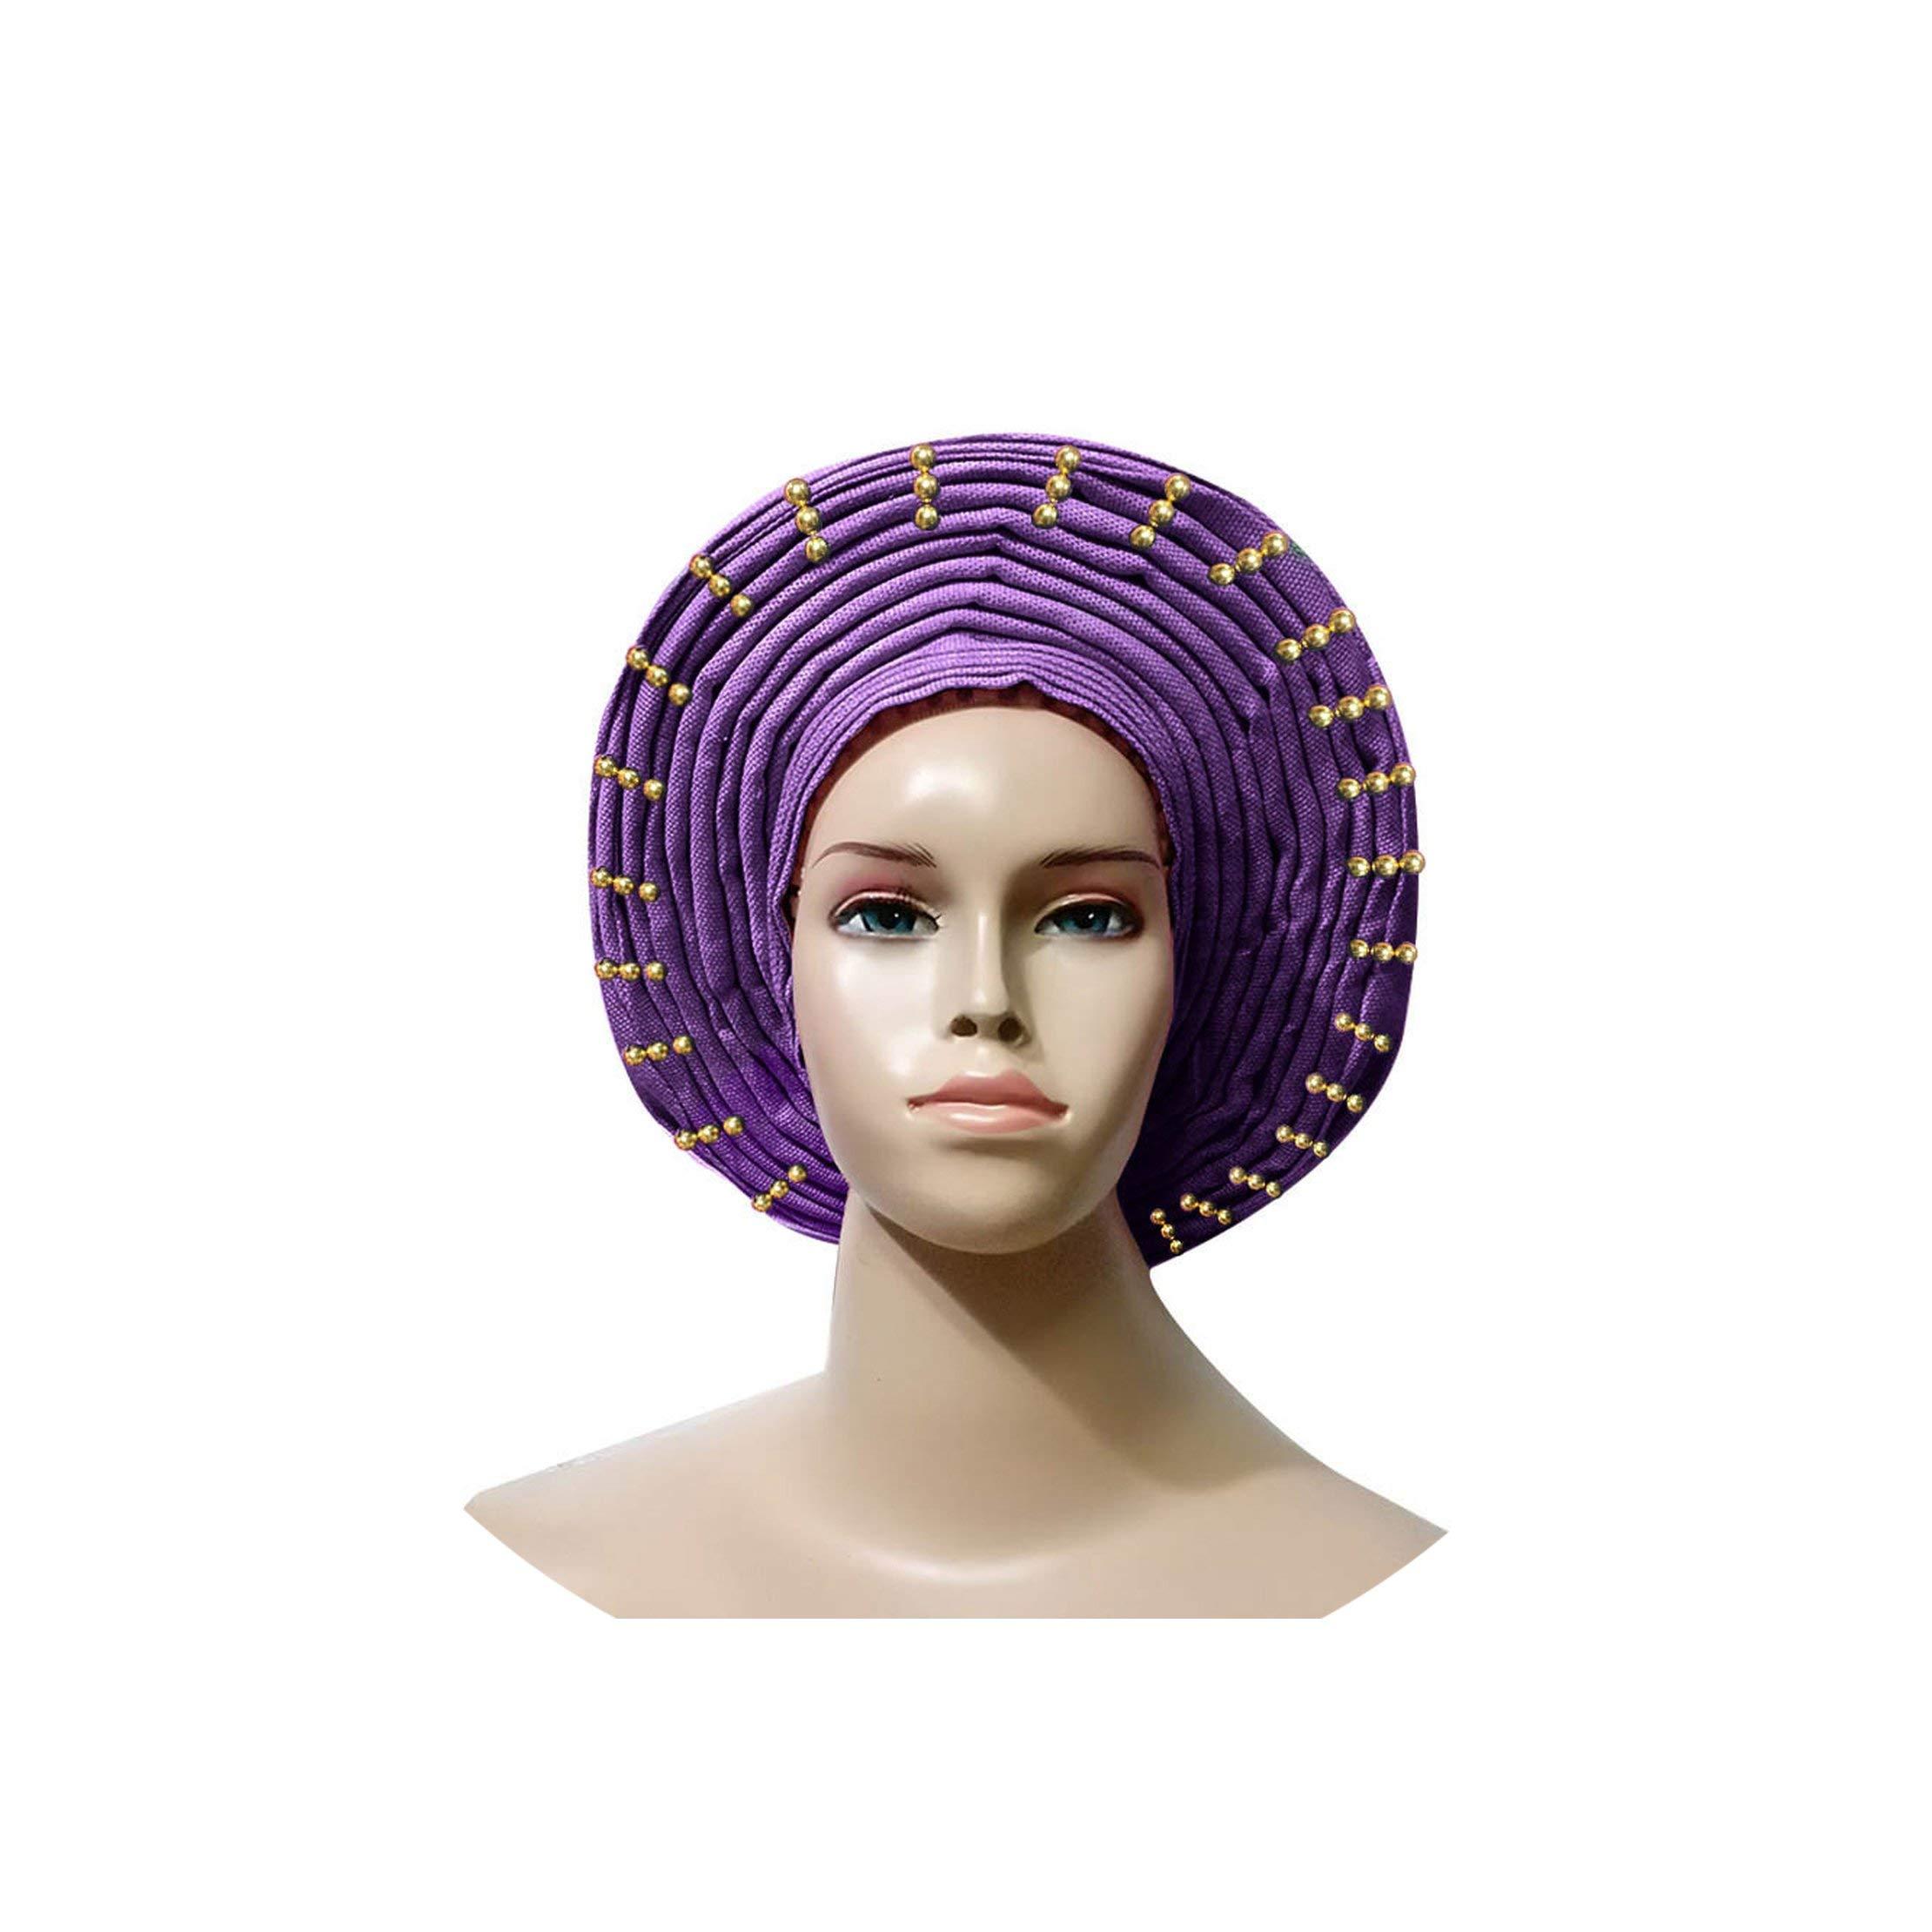 Shower Cap Already Made Head Wrap Ladies Hat Turban Muslim Cap,Purple by Spring-color-Shower cap